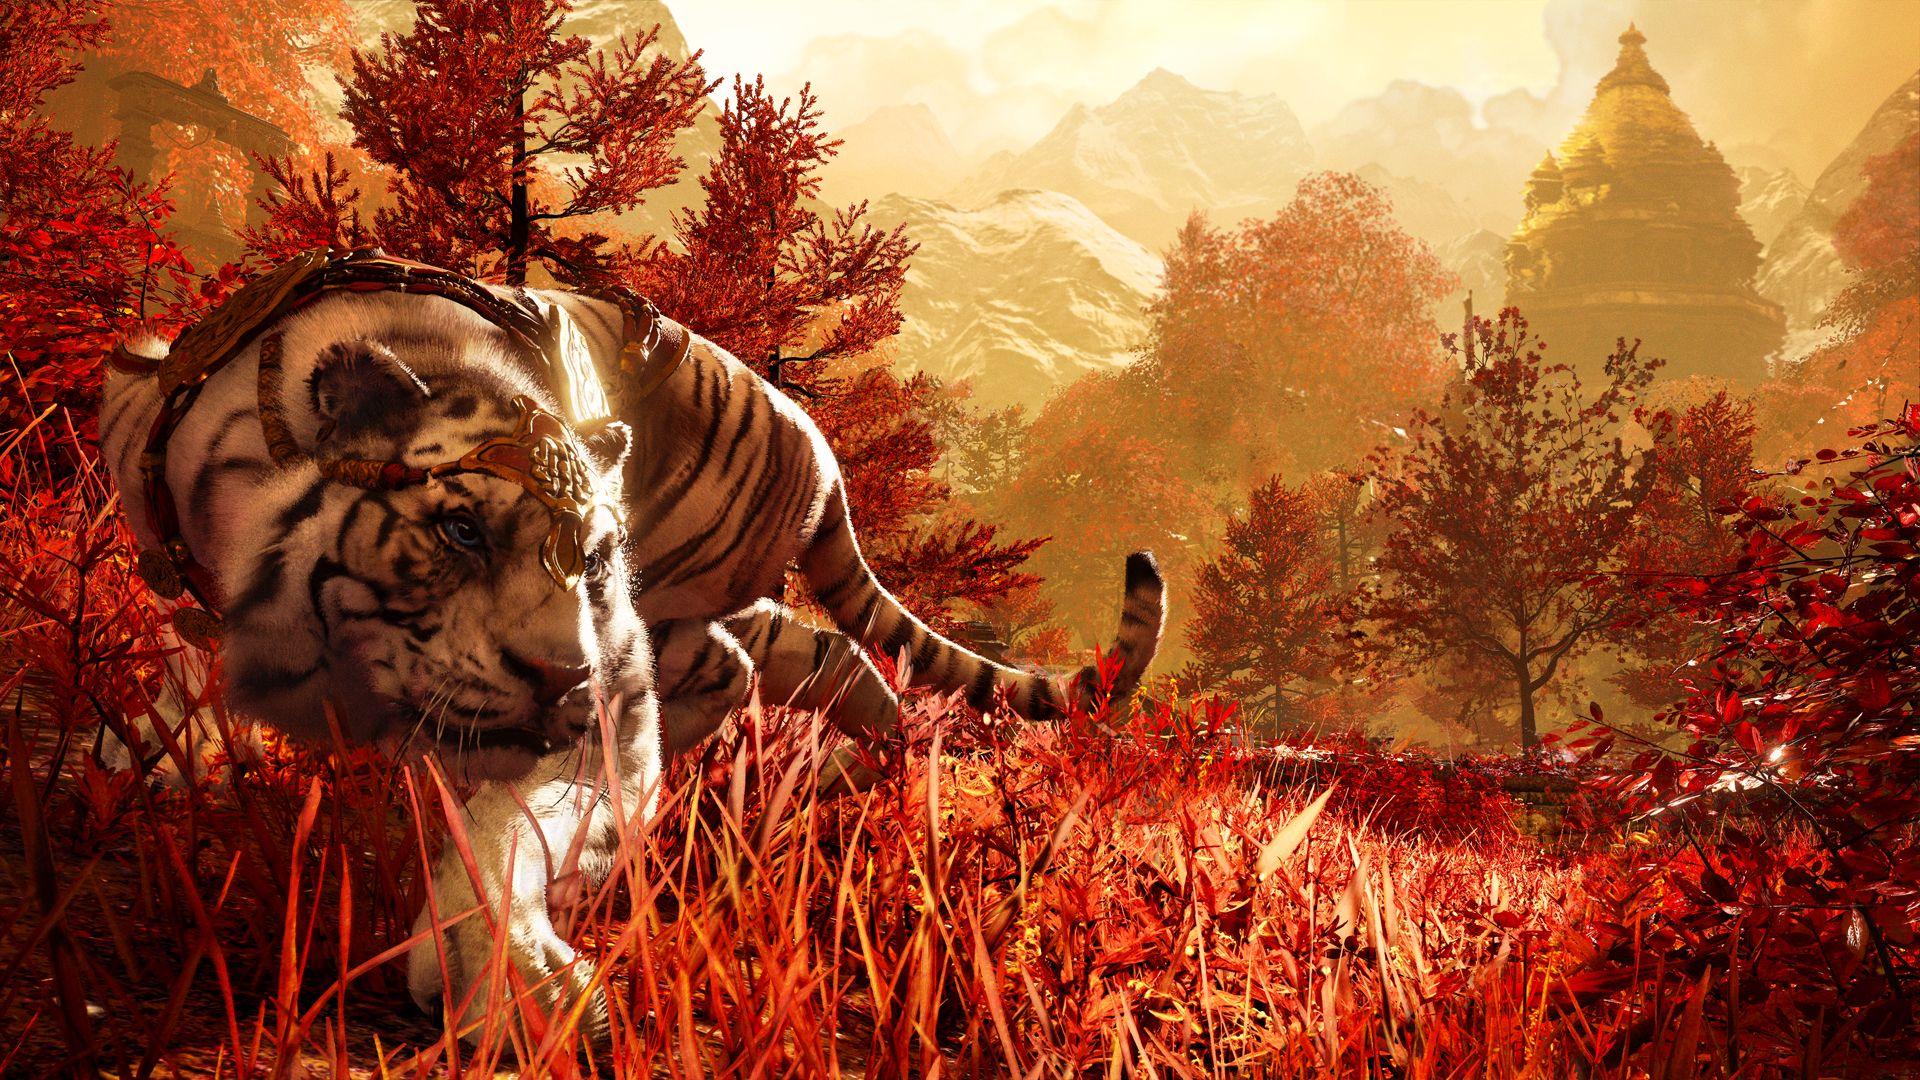 FC4_Screen_ShangriLa_Tiger_Companion_GC_140813_10amCET_1407889655